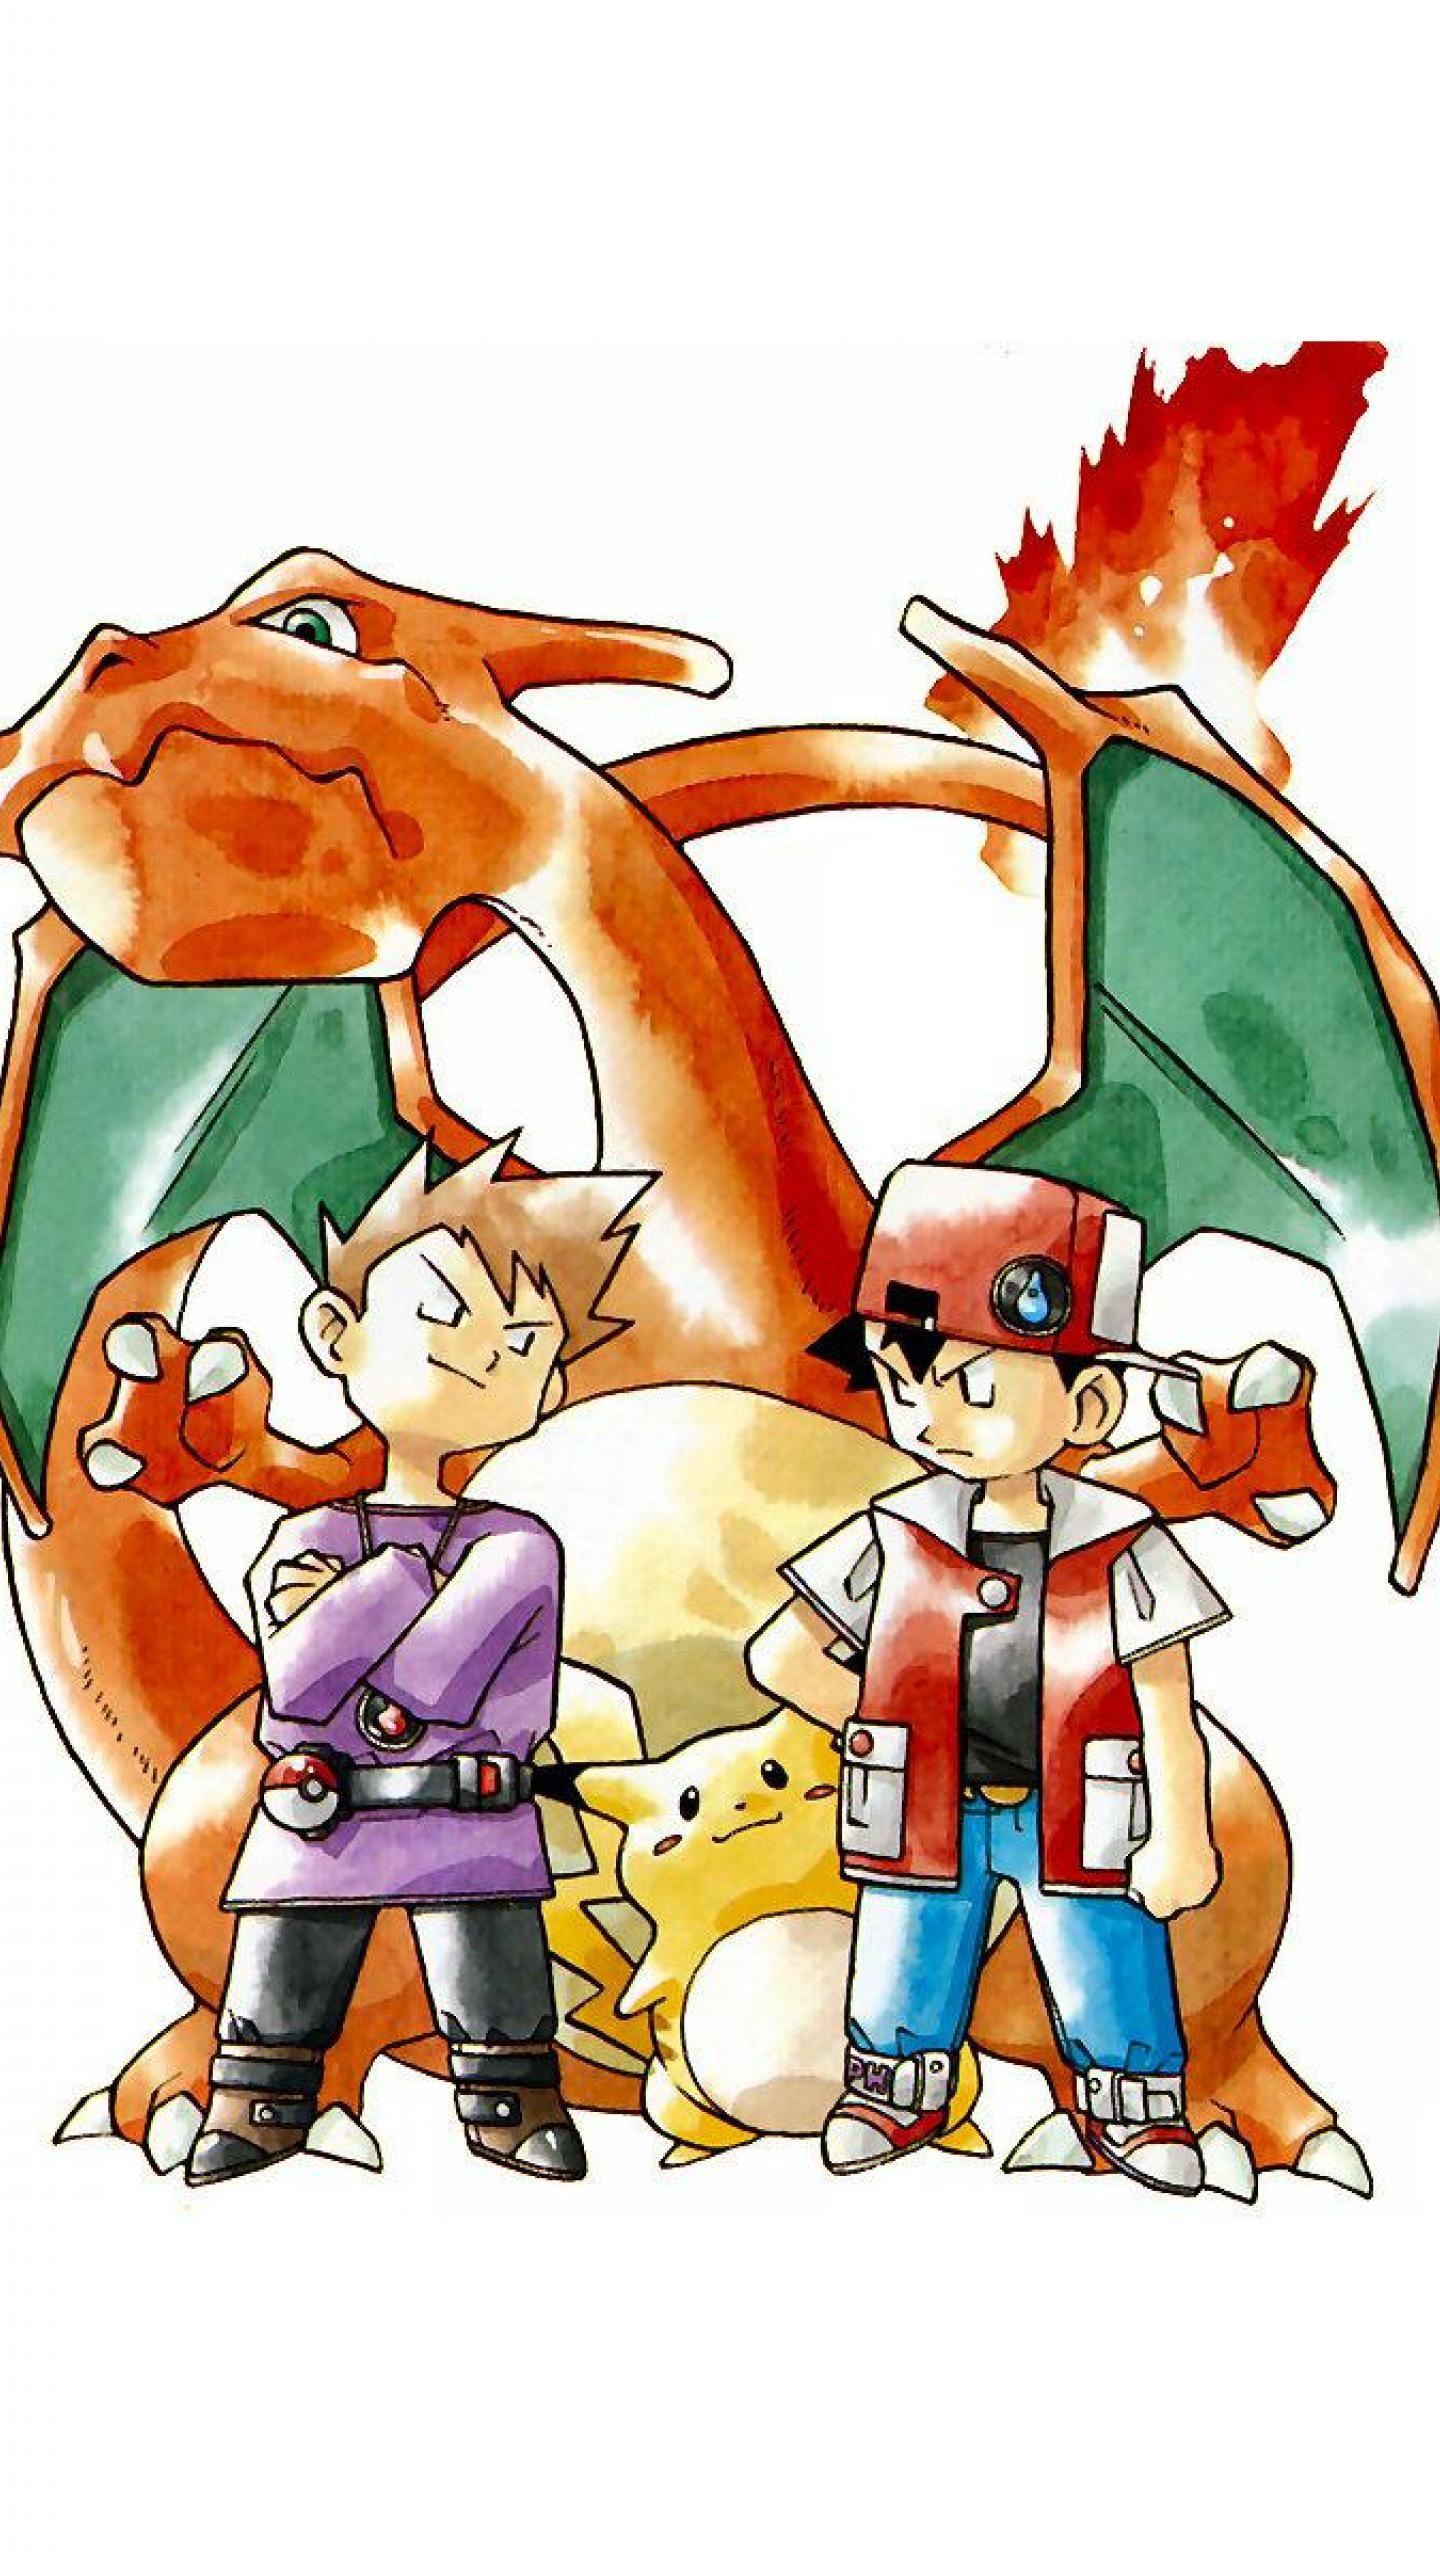 Res: 1440x2560, Pokemon Charizard Wallpaper